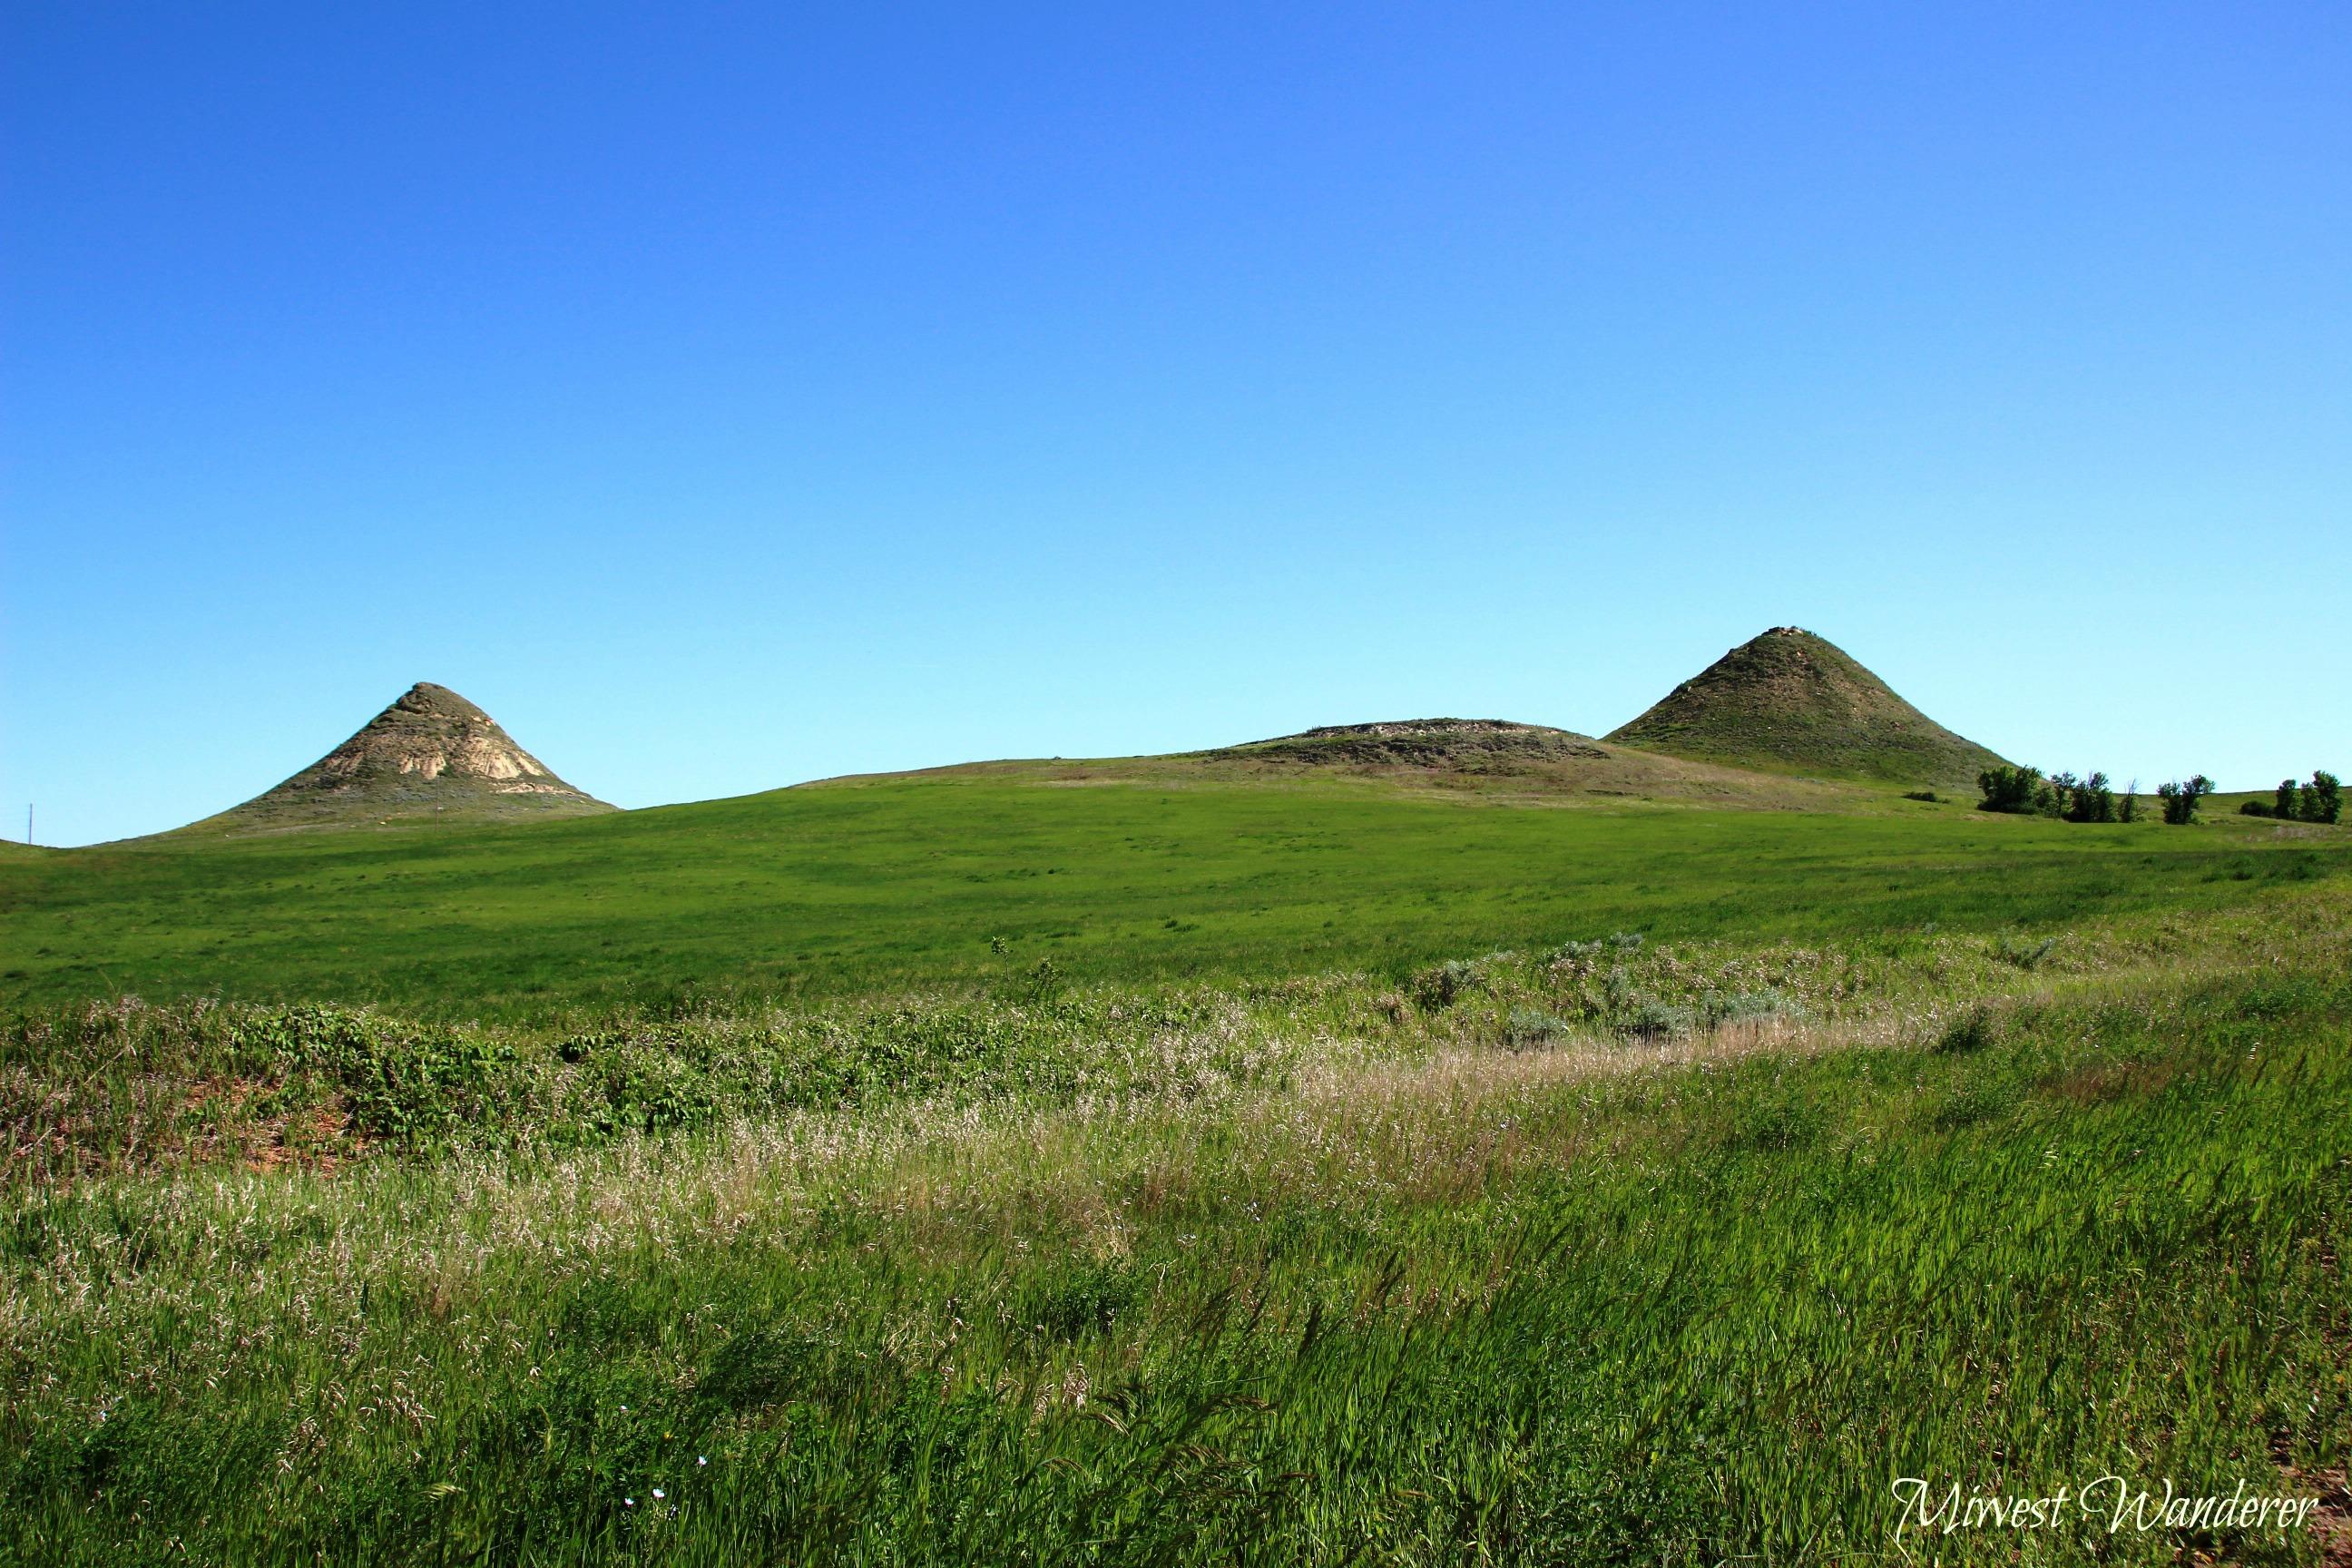 North dakota morton county glen ullin - Twin Buttes Near Glen Ullin North Dakota